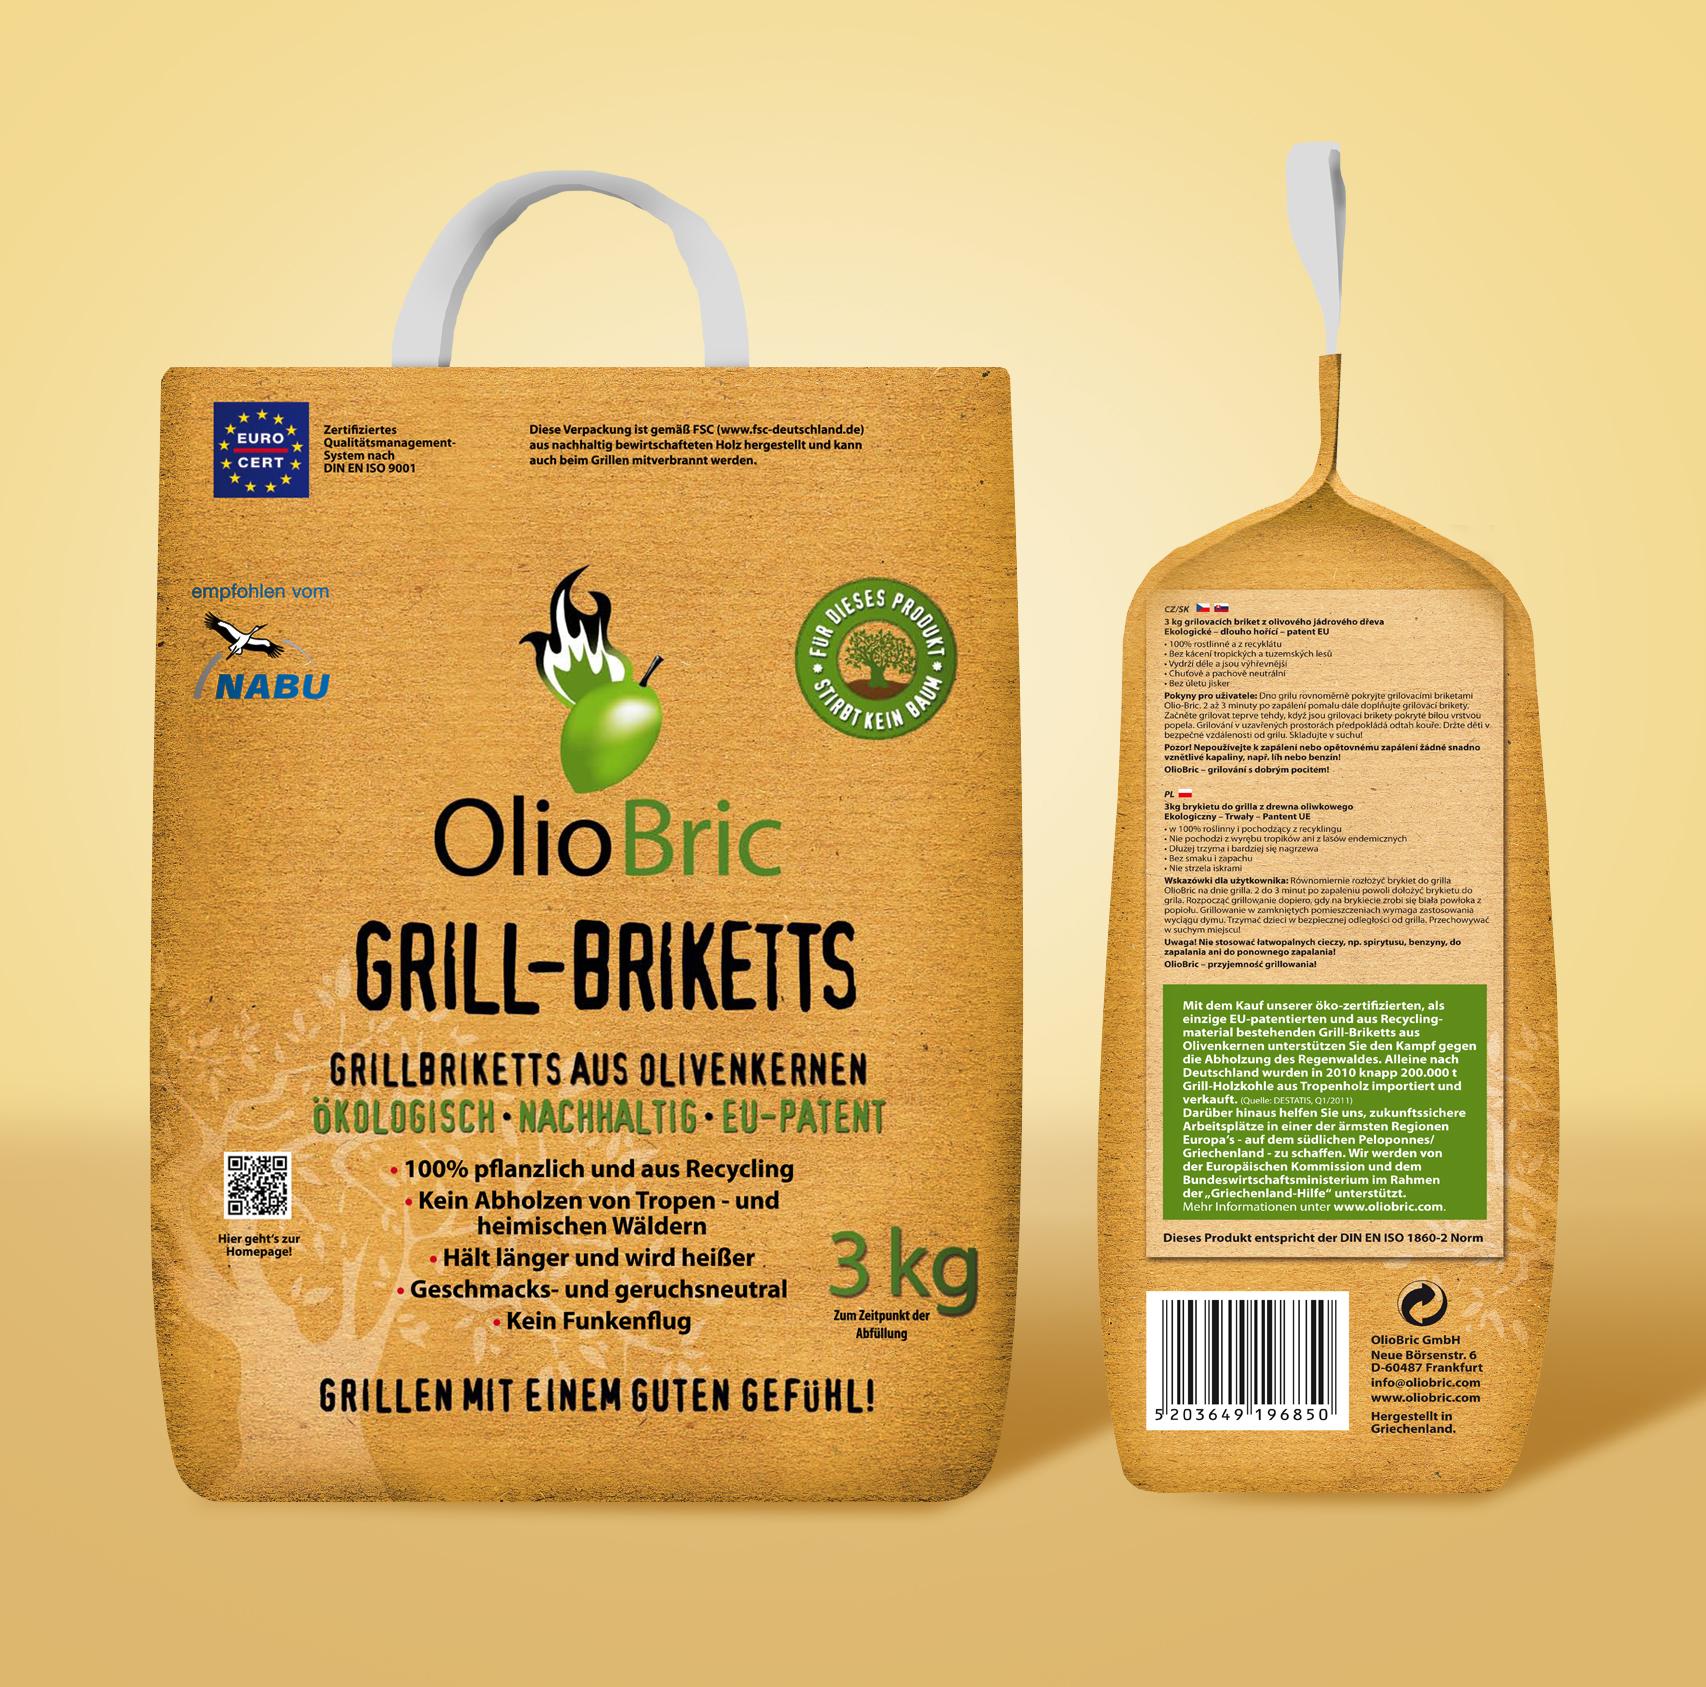 Olio Bric Gourmet-Grill-Briketts 3kg